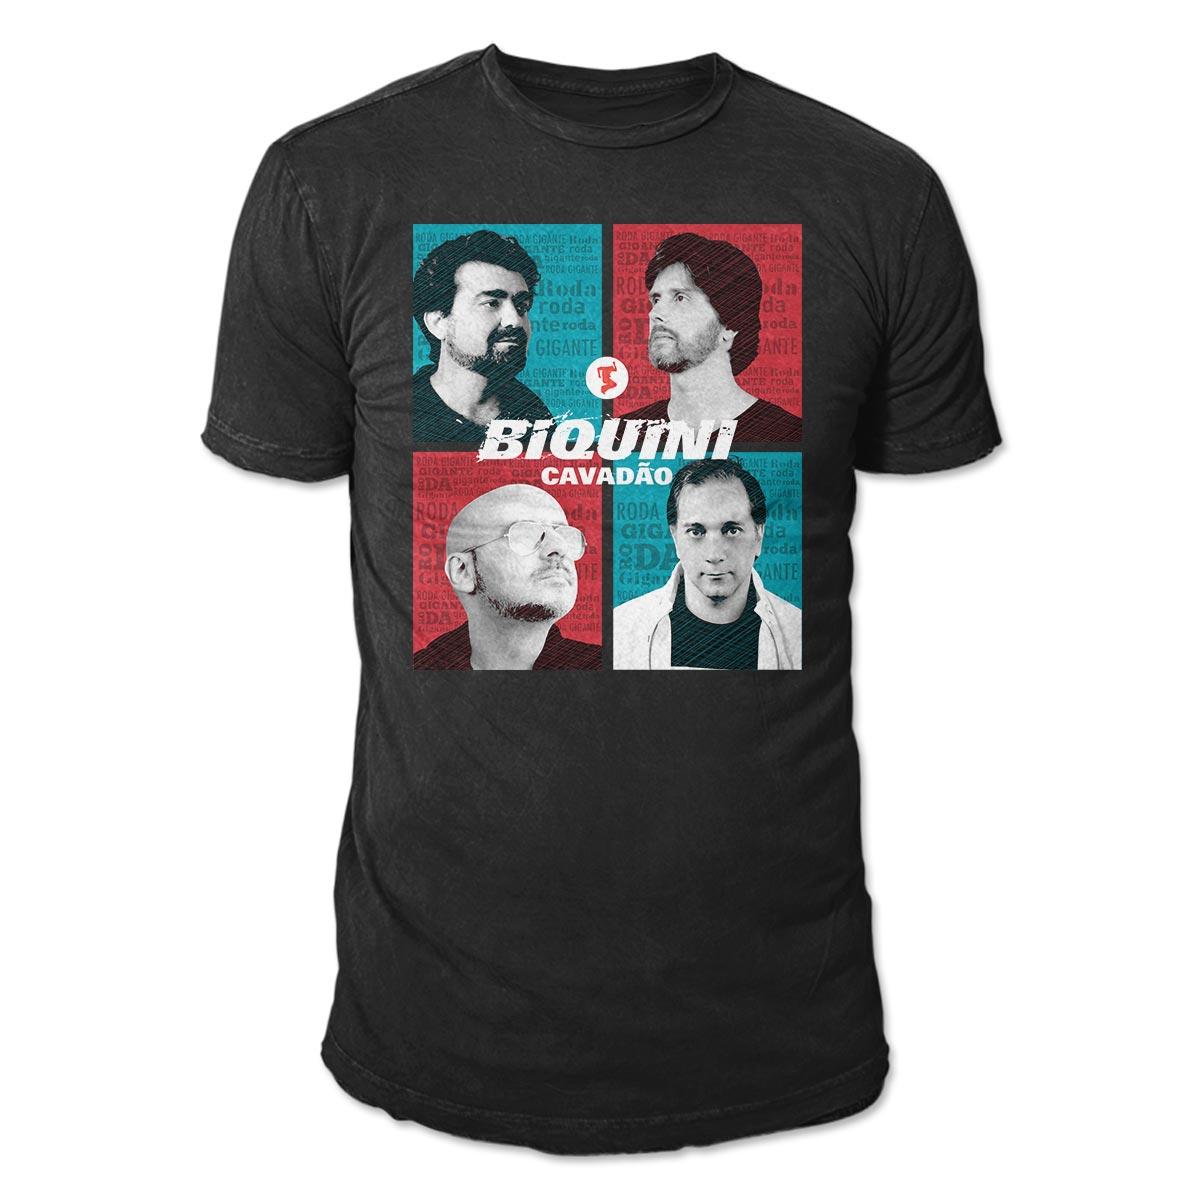 Camiseta Masculina Biquini Cavadao Roda Gigante  - bandUP Store Marketplace